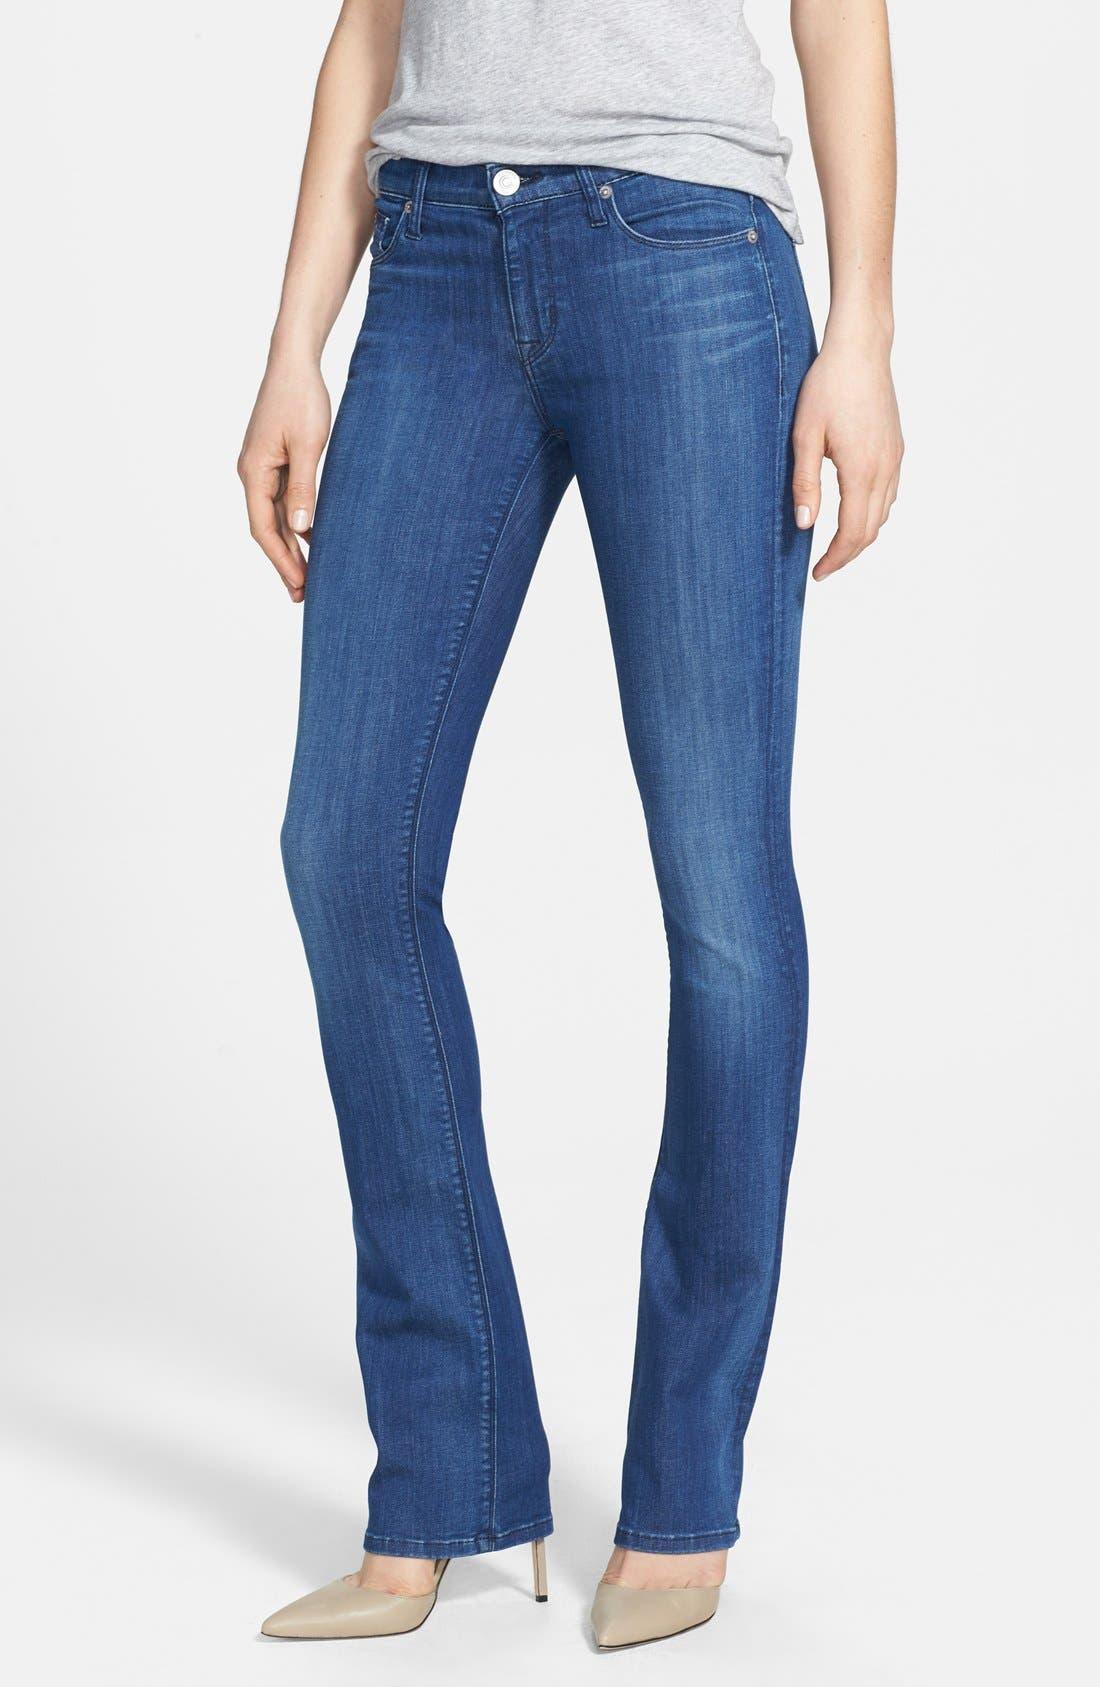 Main Image - Hudson Jeans 'Elle' Baby Bootcut Jeans